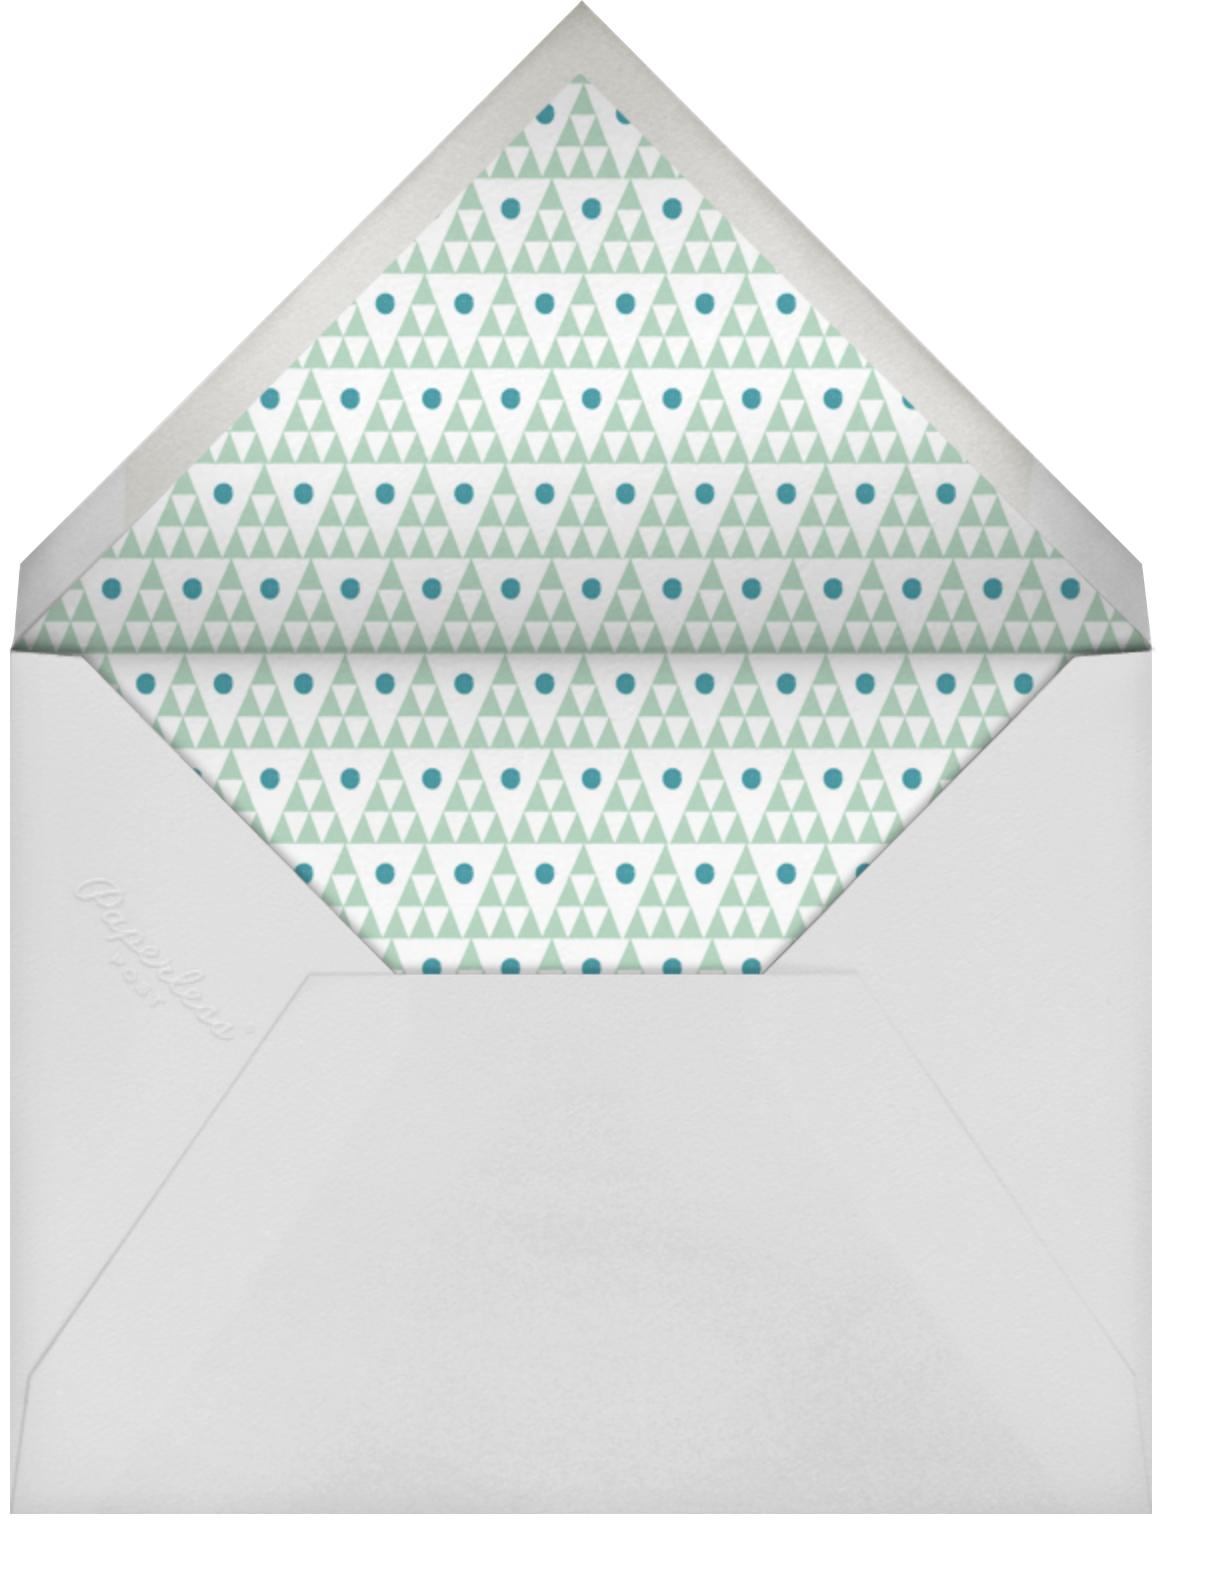 Five Seconds - Medium - Mr. Boddington's Studio - Envelope